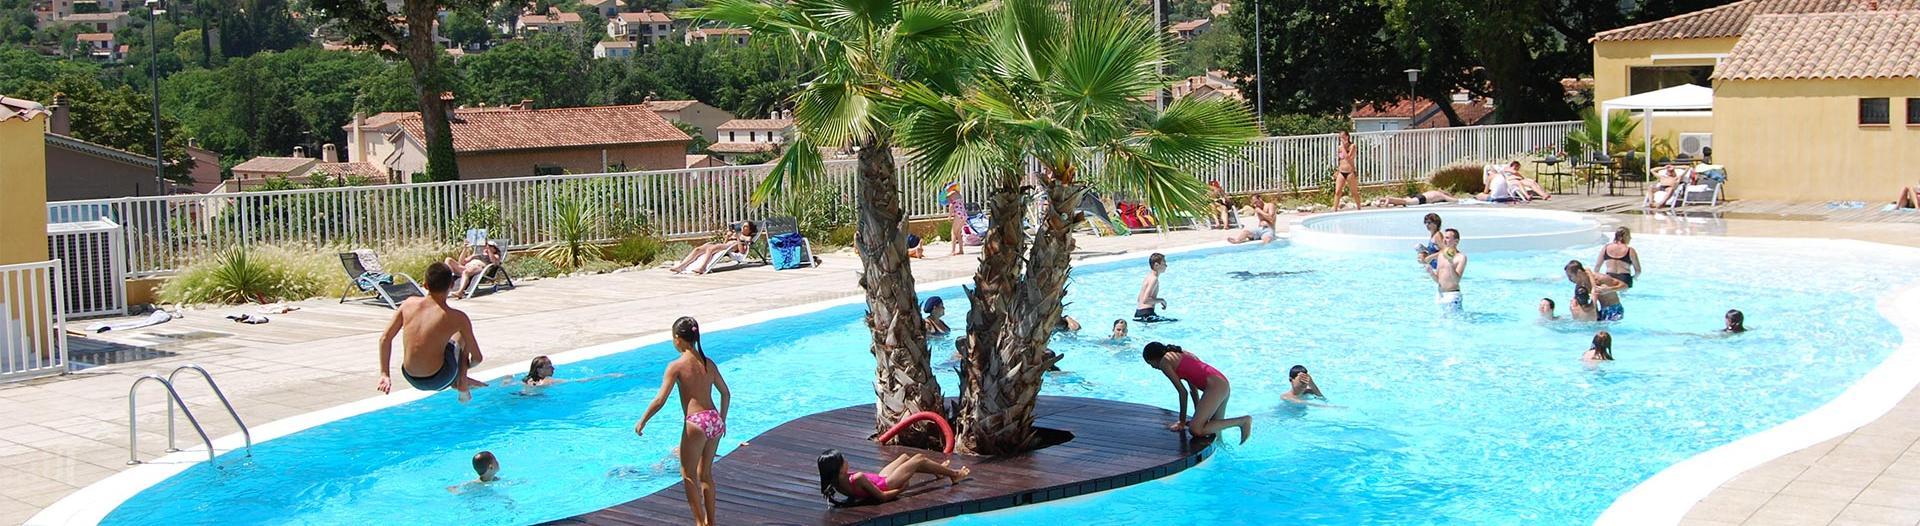 slider-camping-galoubet-piscine